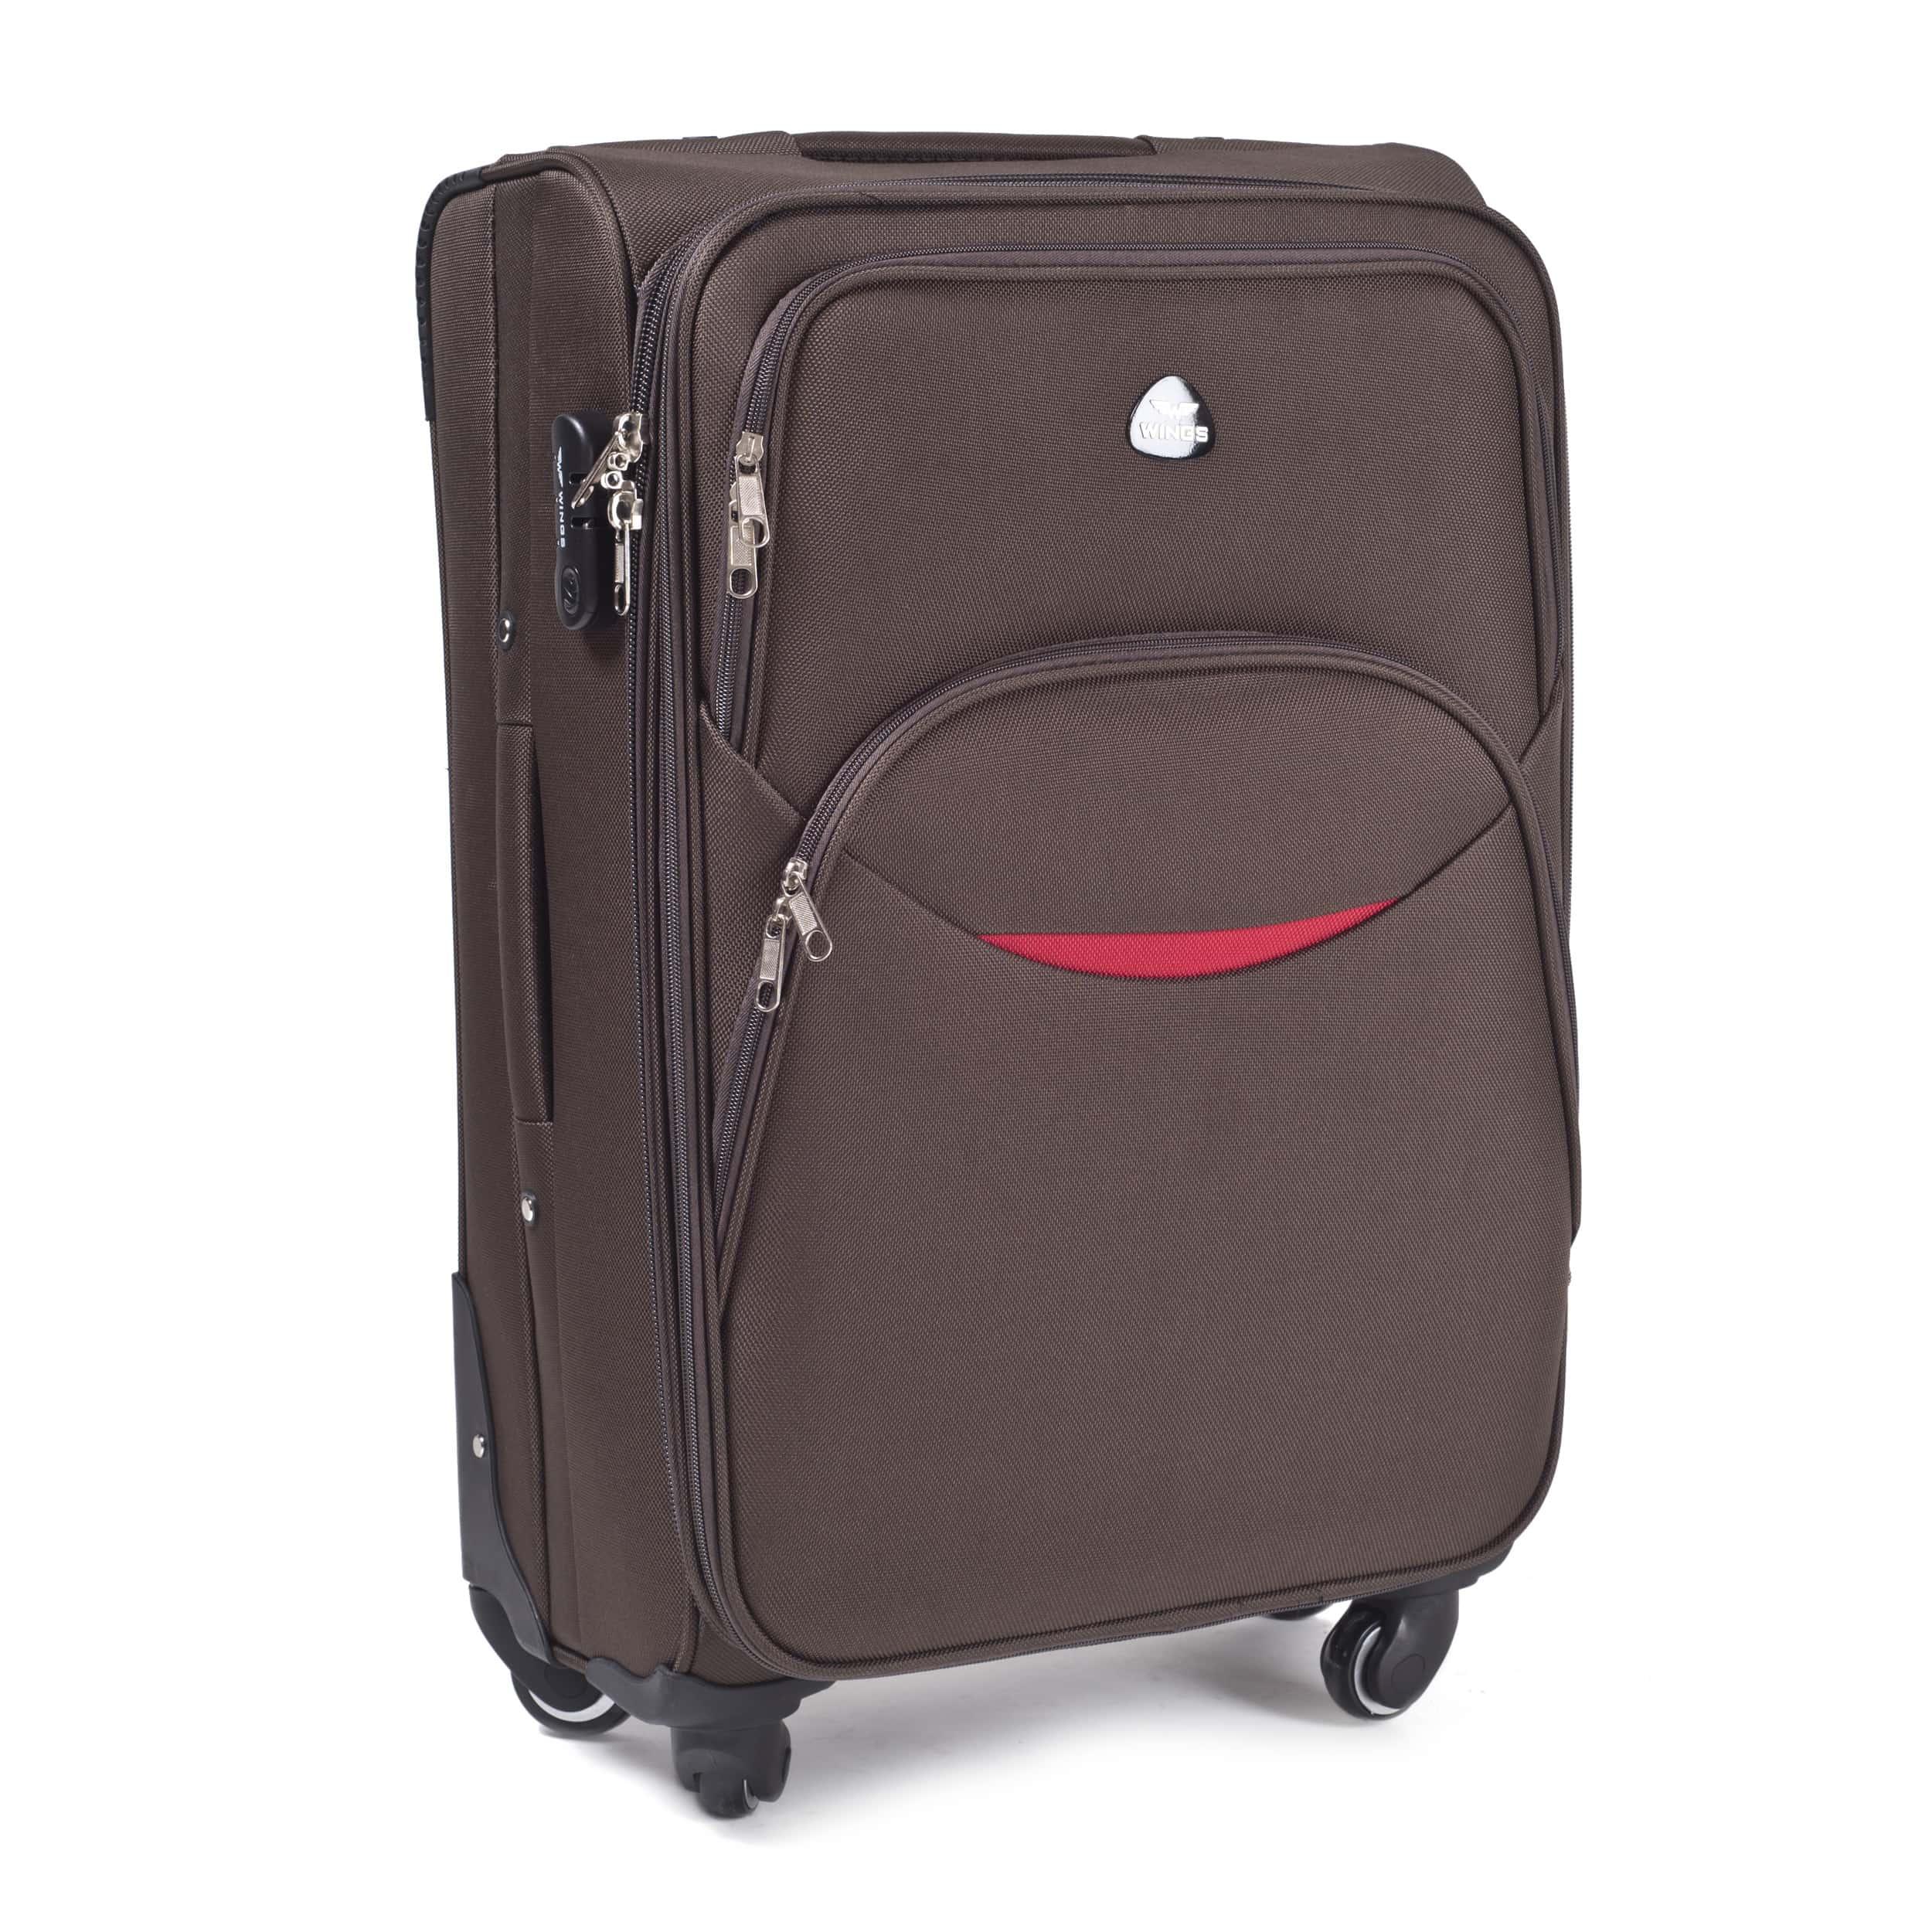 Малый Тканевый Чемодан Wings 1708-4 S Coffe PREMIUM на 4-х прочных колесах! Для багажа,до 10 кг